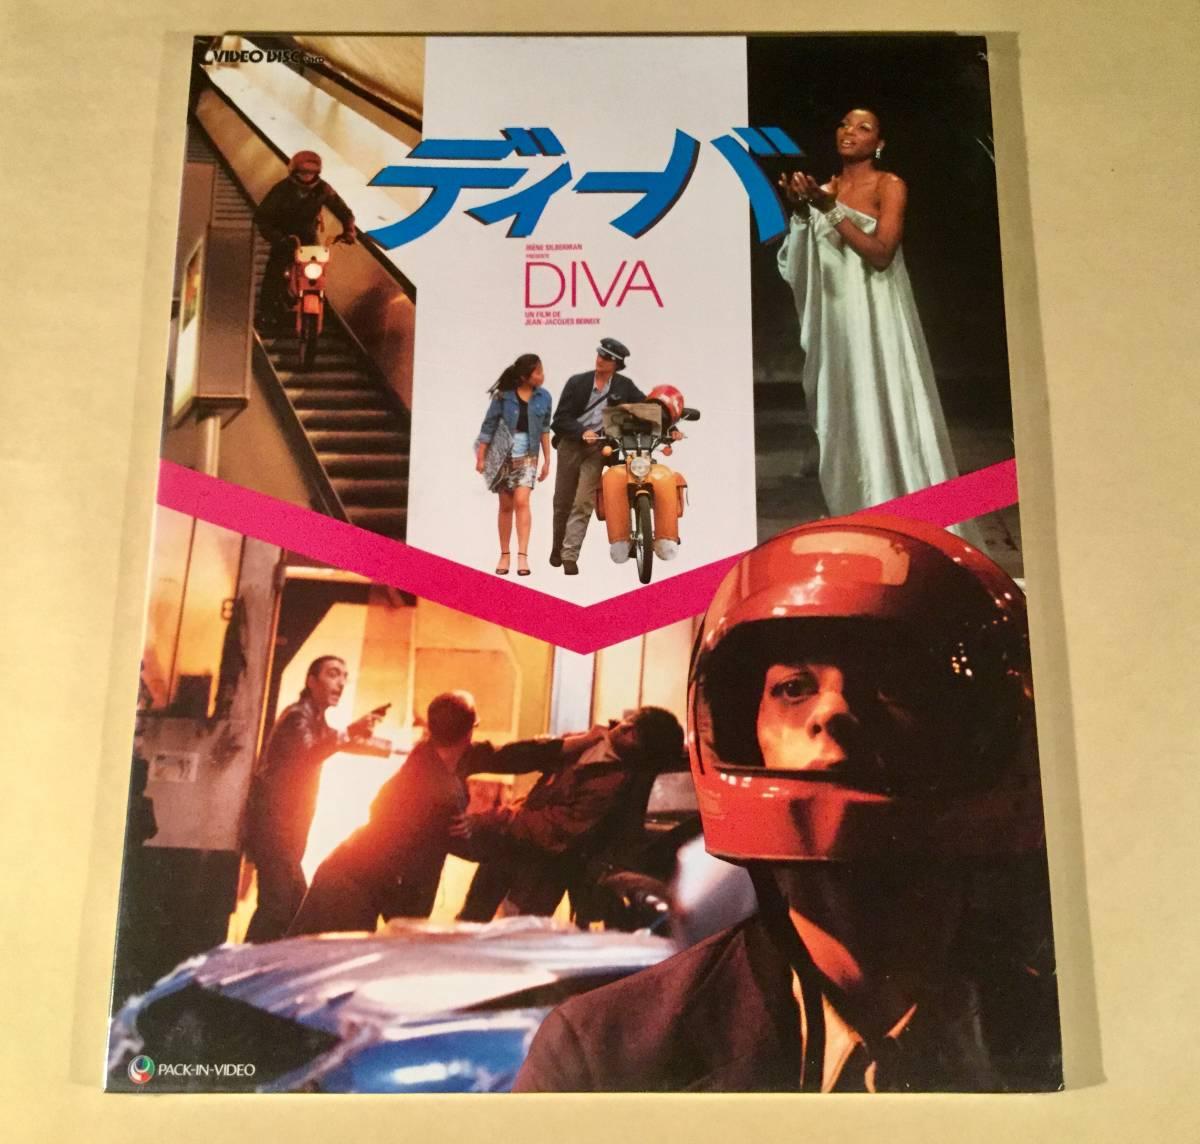 VHD Videodisc■『ディーバ』サスペンス・ロマンの傑作!■シールド未開封品!_画像1